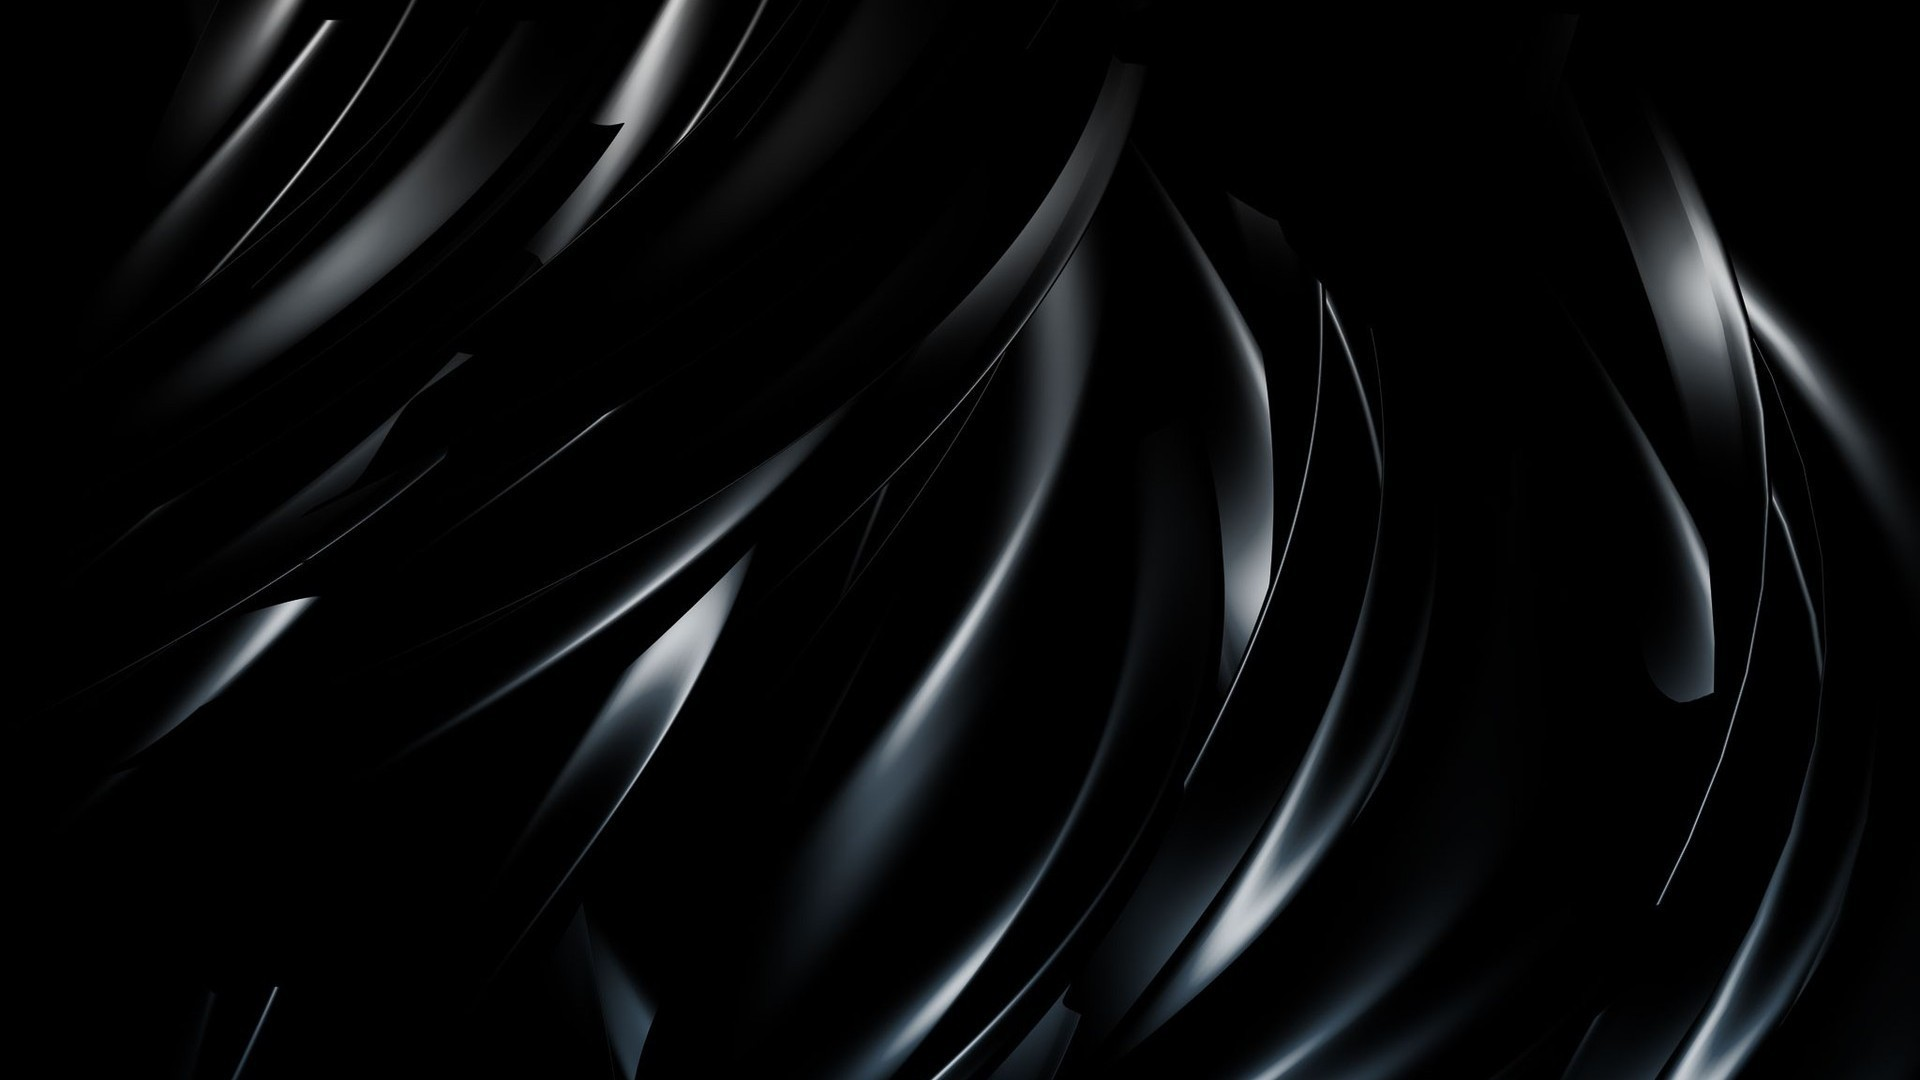 Dark Abstract Wallpapers Widescreen